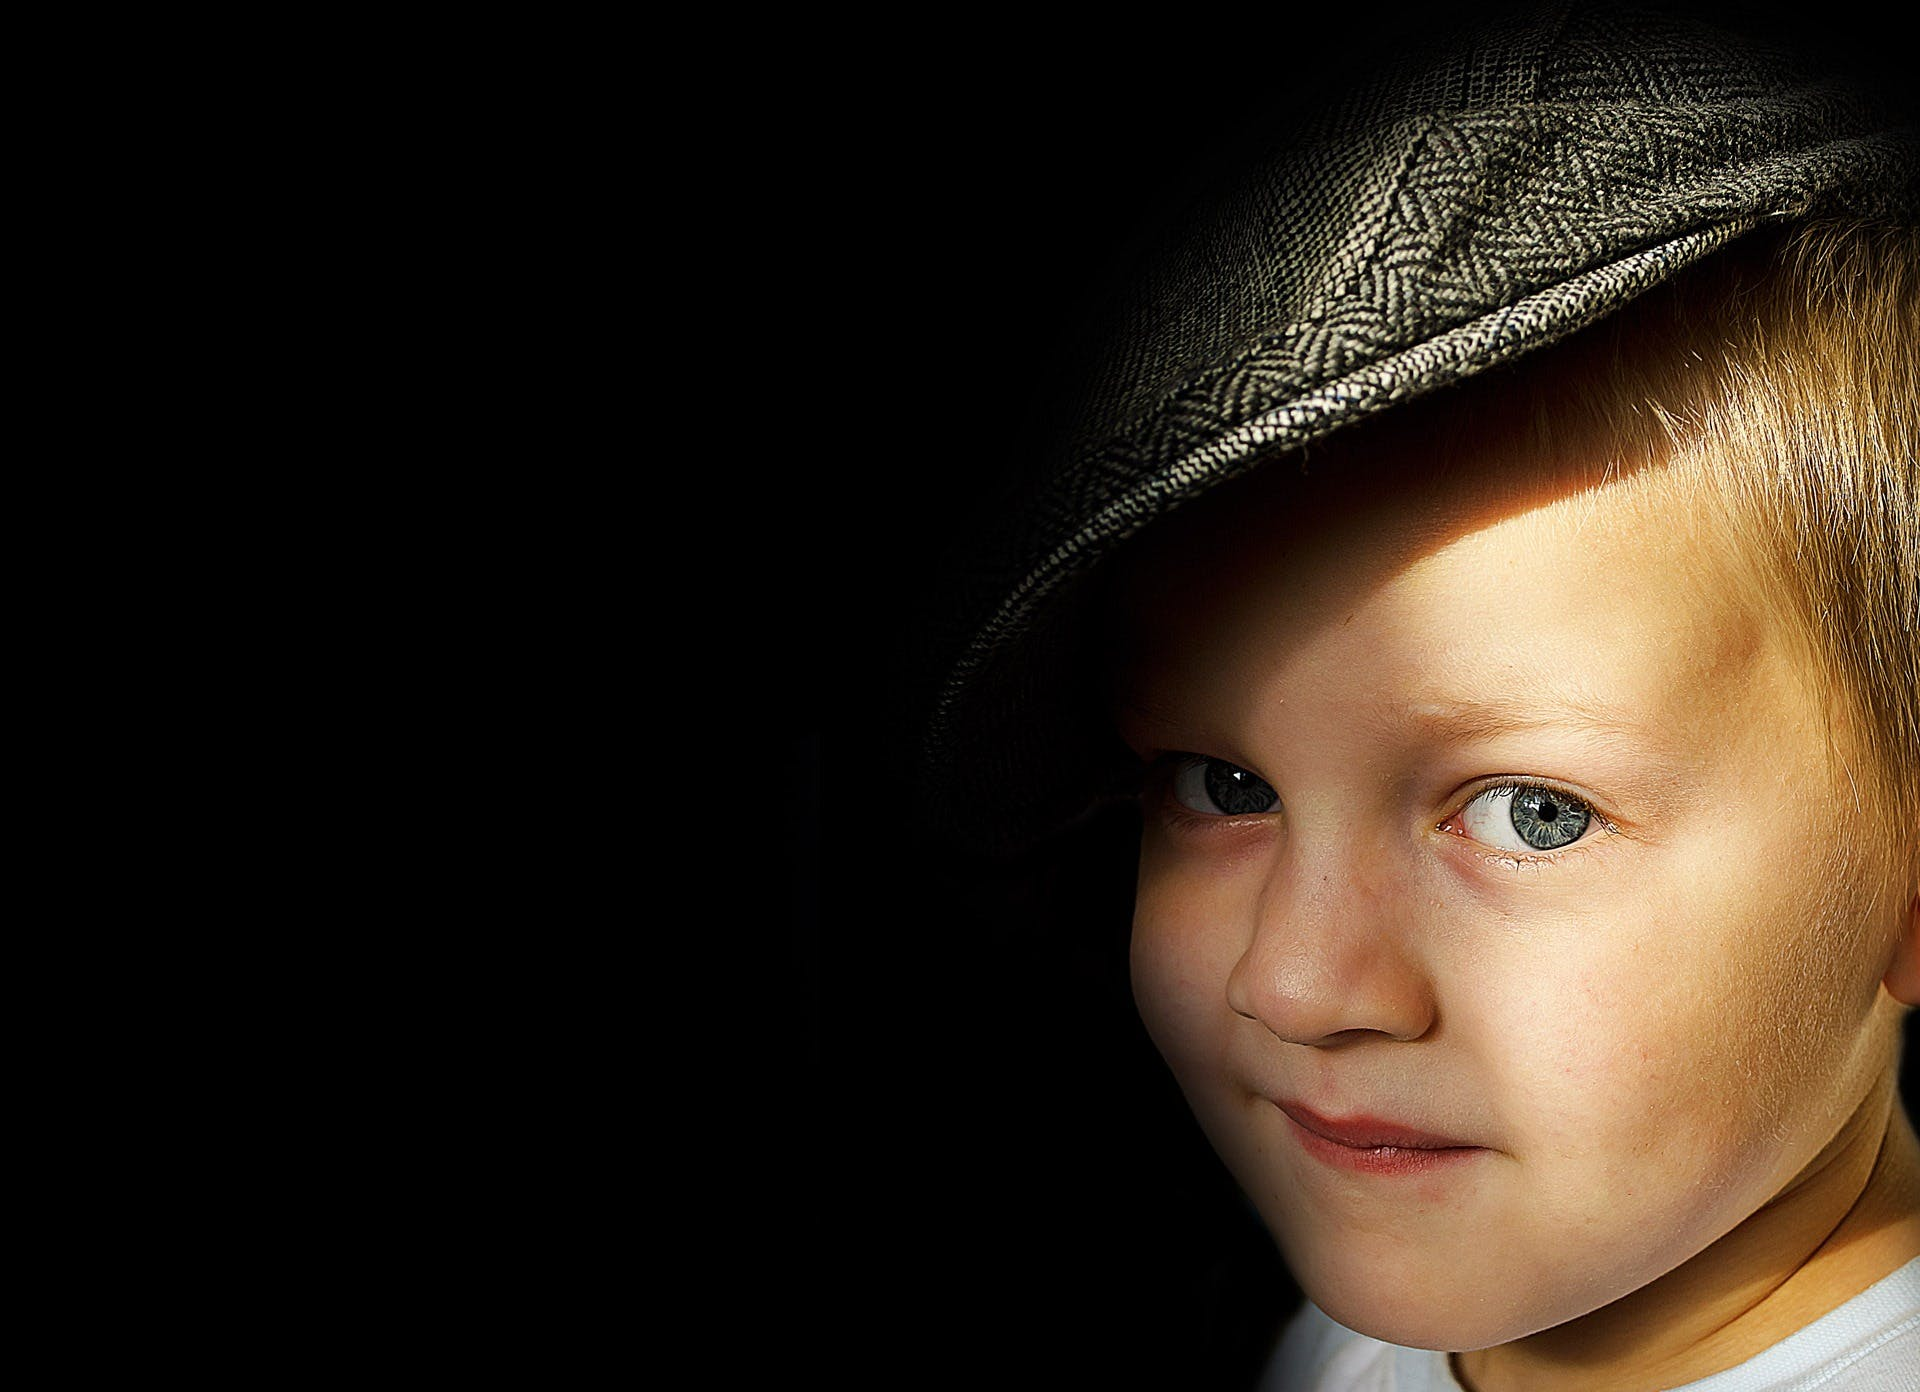 Boy Wearing Herringbone Flat Cap